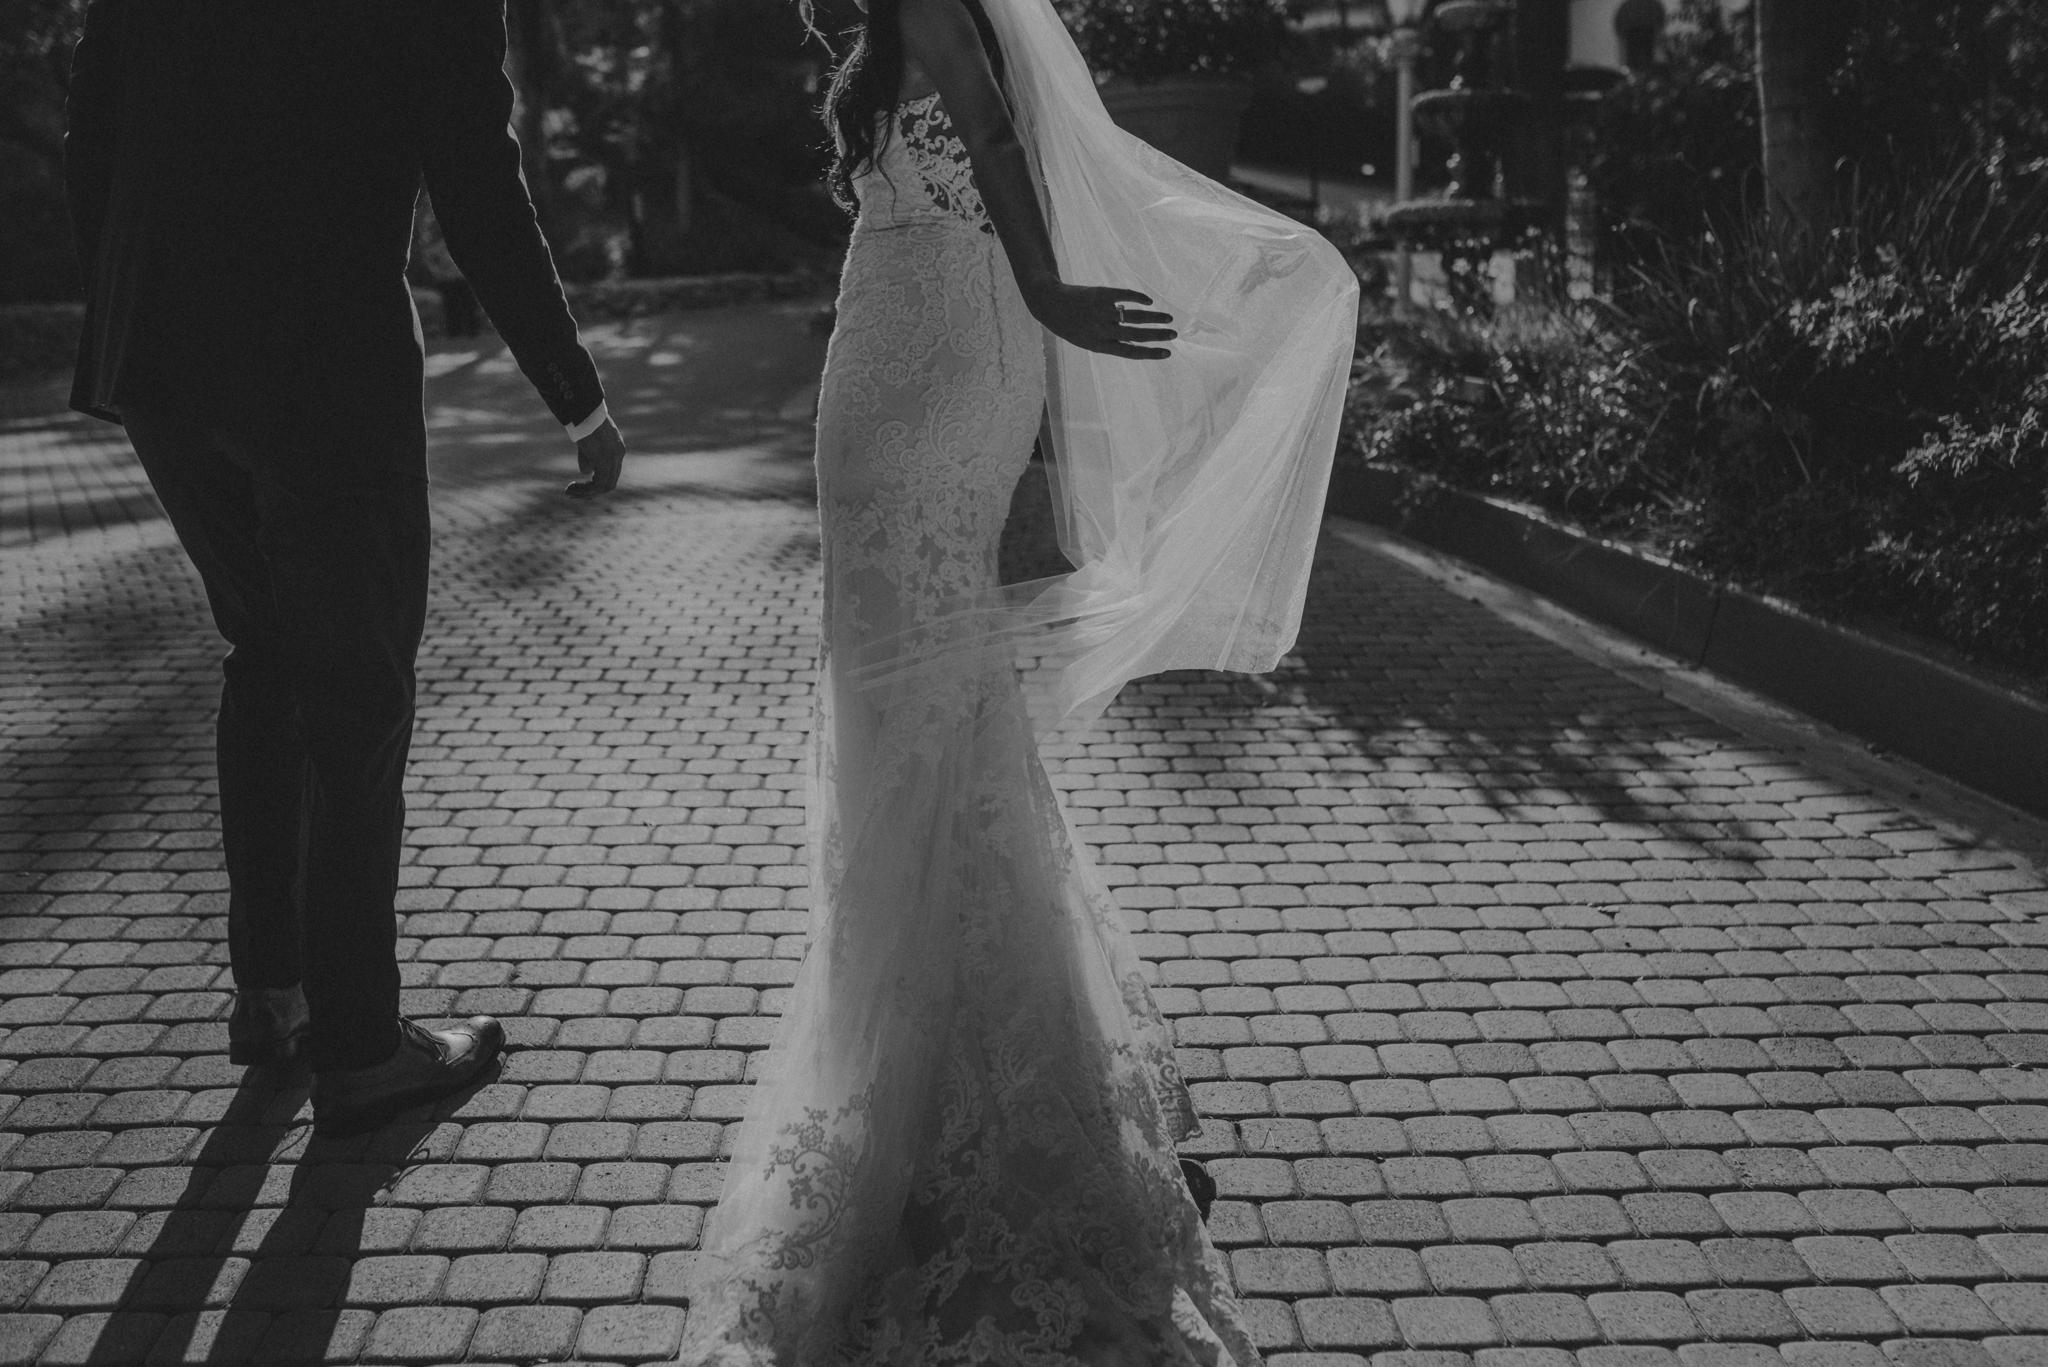 Isaiah + Taylor Photography - Rancho Las Lomas Wedding, Los Angeles Wedding Photographer-086.jpg